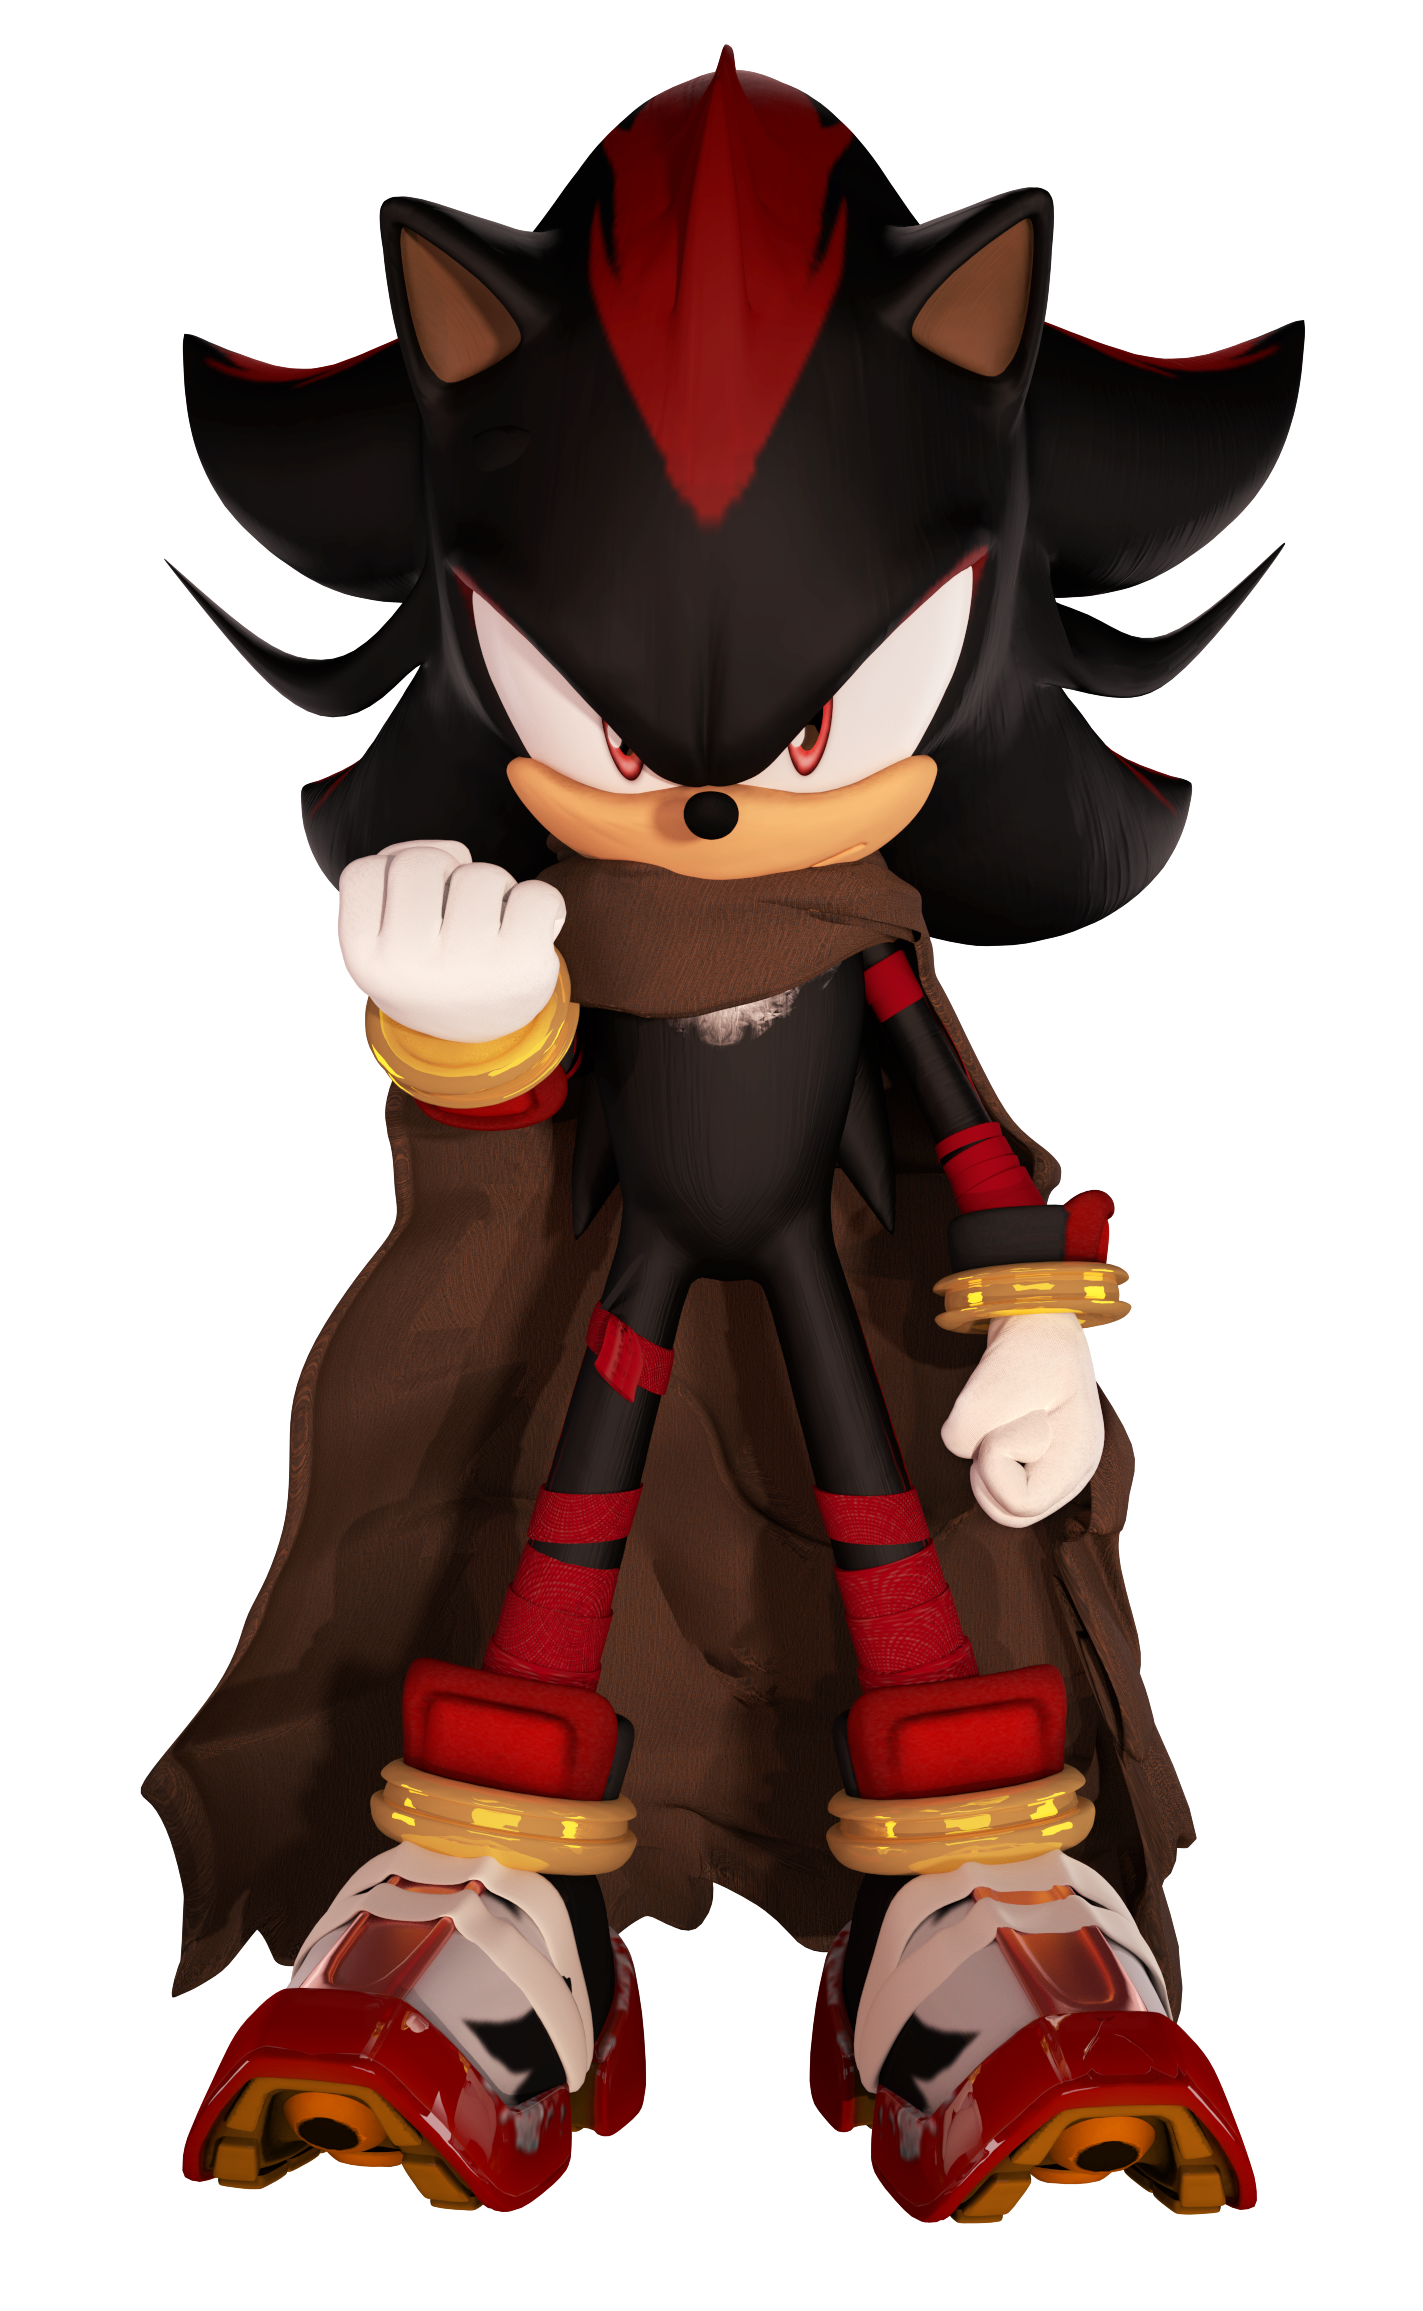 Shadow the hedgehog boom fan design 2 by finnakira on deviantart - Shadow sonic boom ...